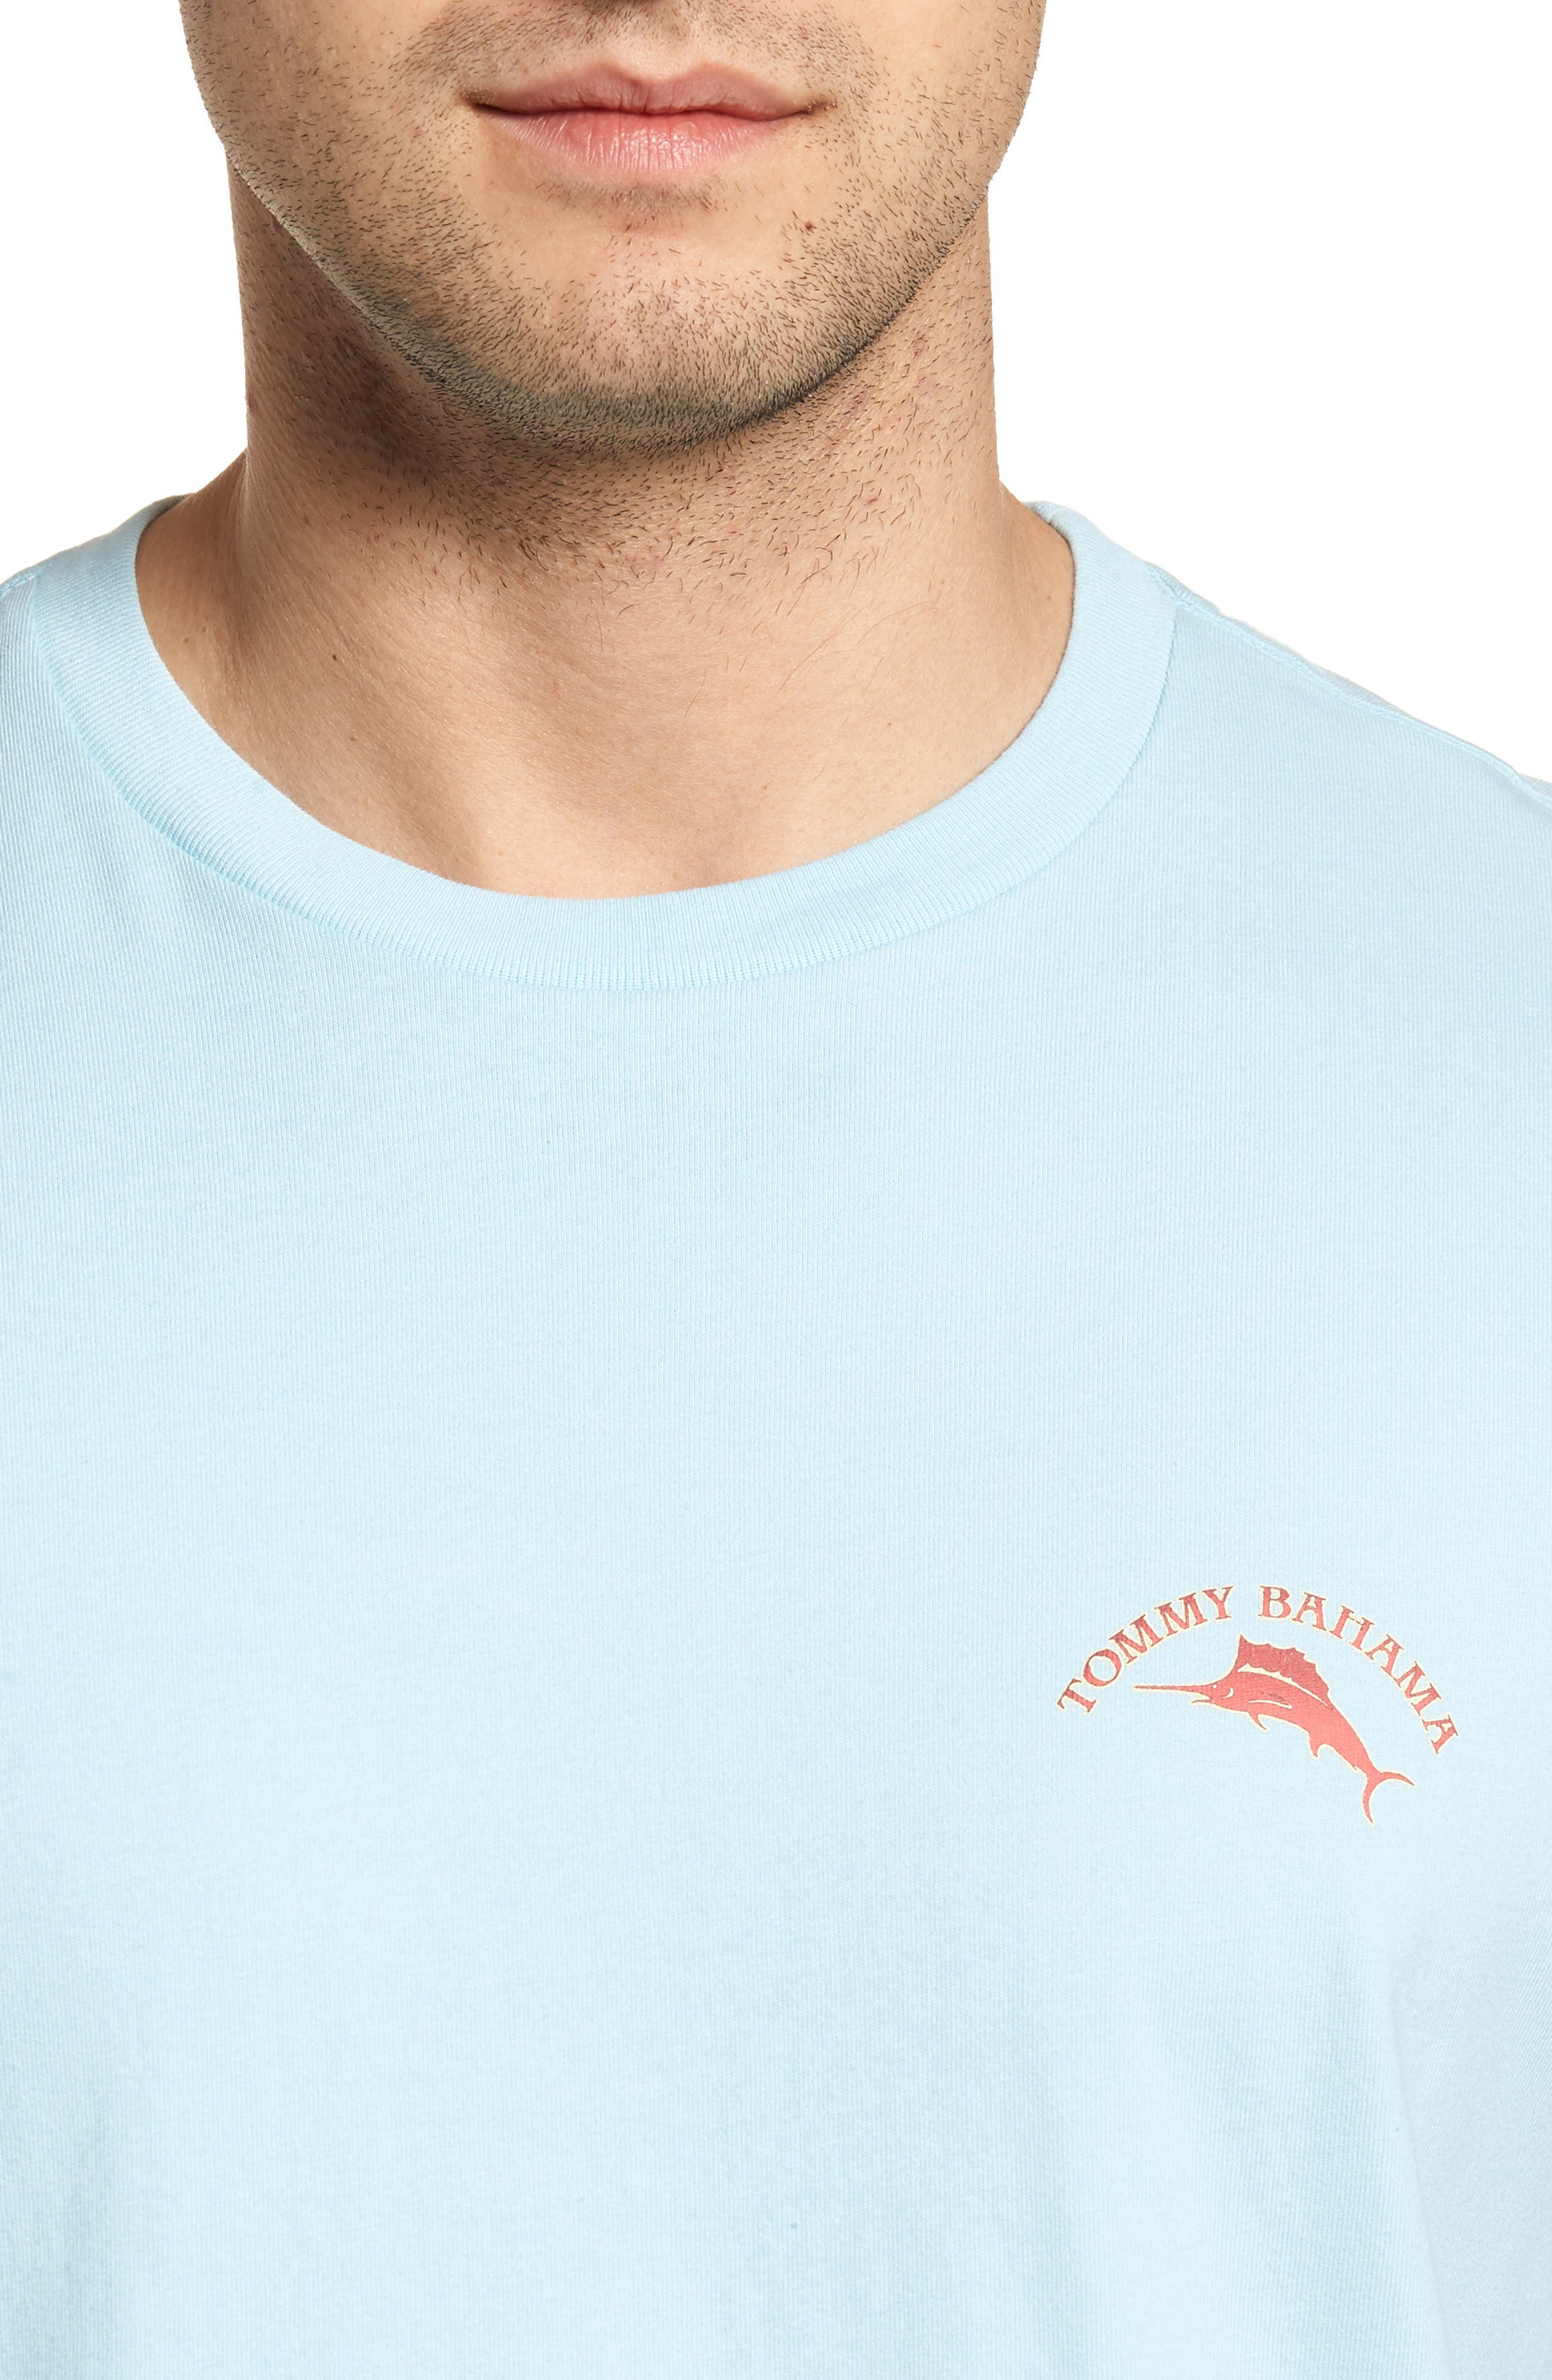 Zinspiration T-Shirt,                             Alternate thumbnail 4, color,                             Opal